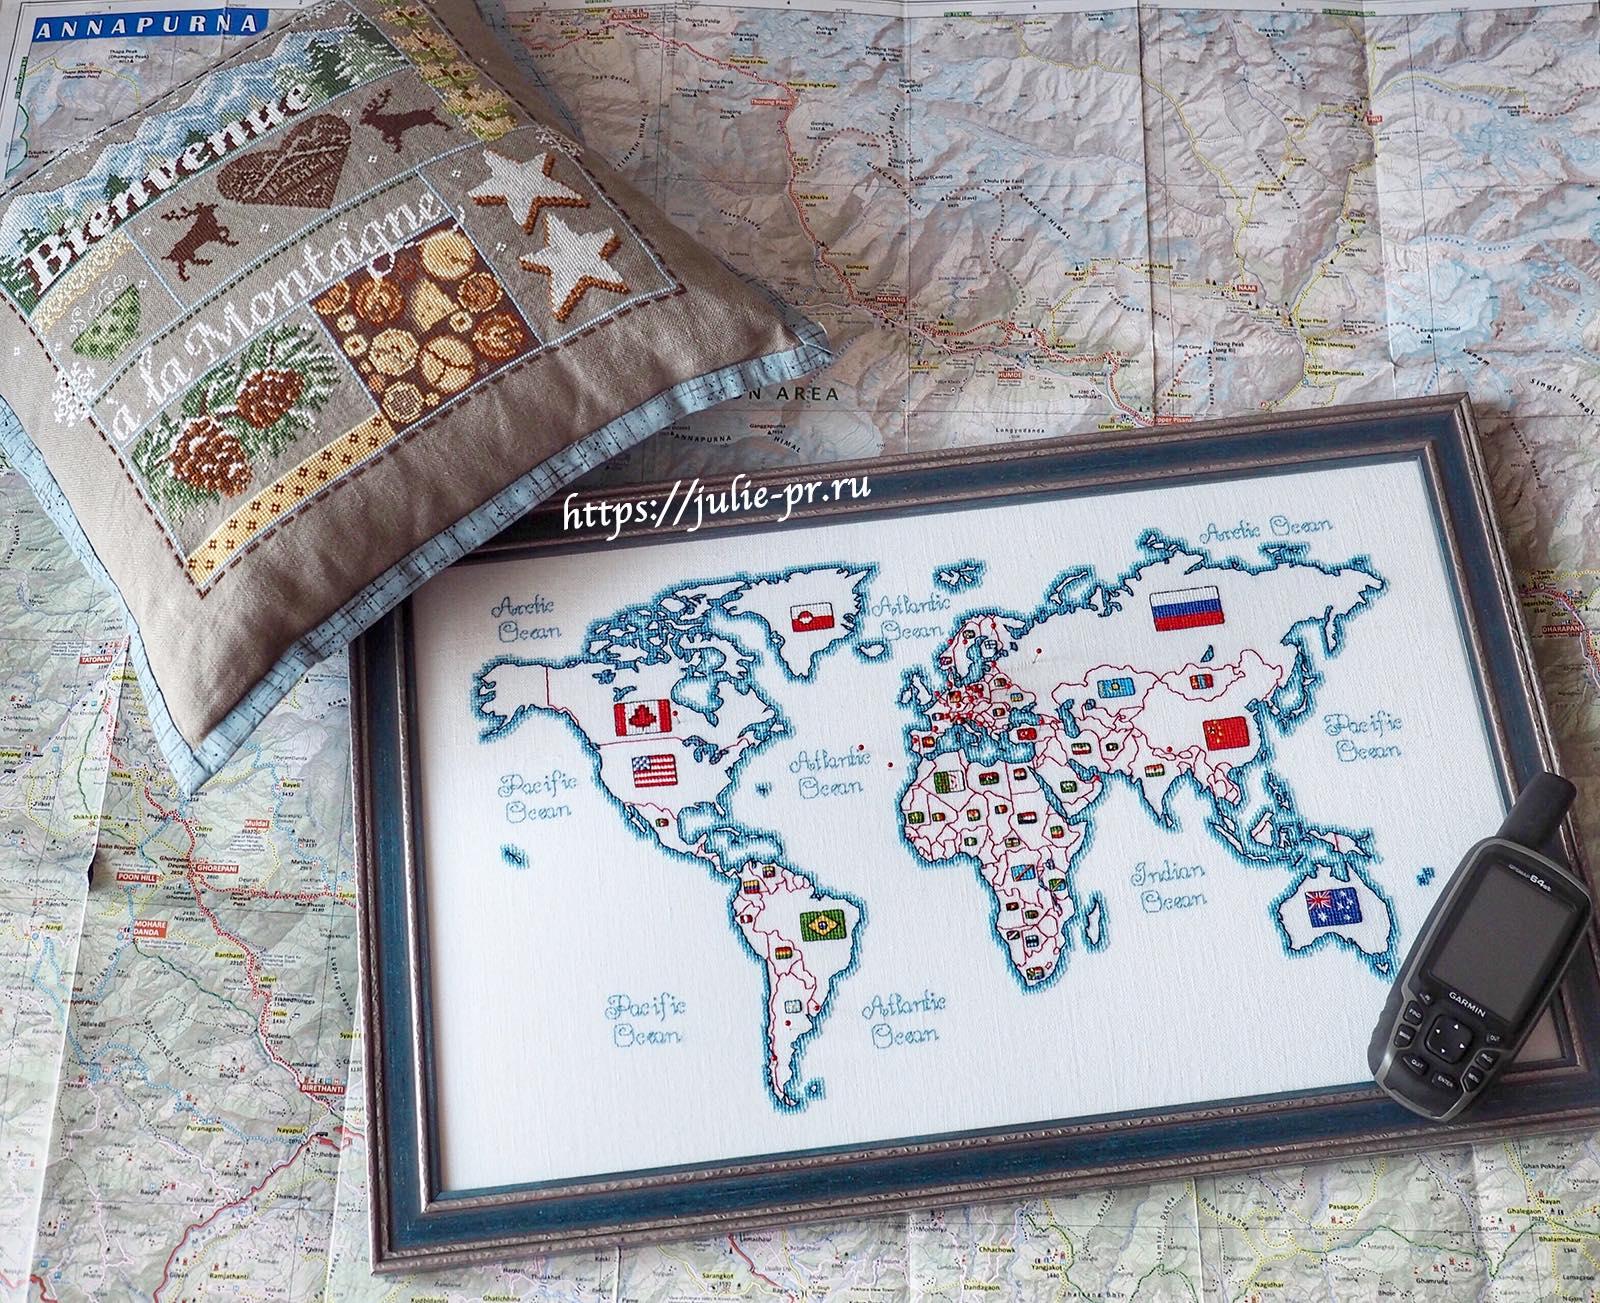 Карта мира DMC K3413 - Oceania collection и подушка с вышивкой по схеме Madame la Fee - Bienvenue a la montagne